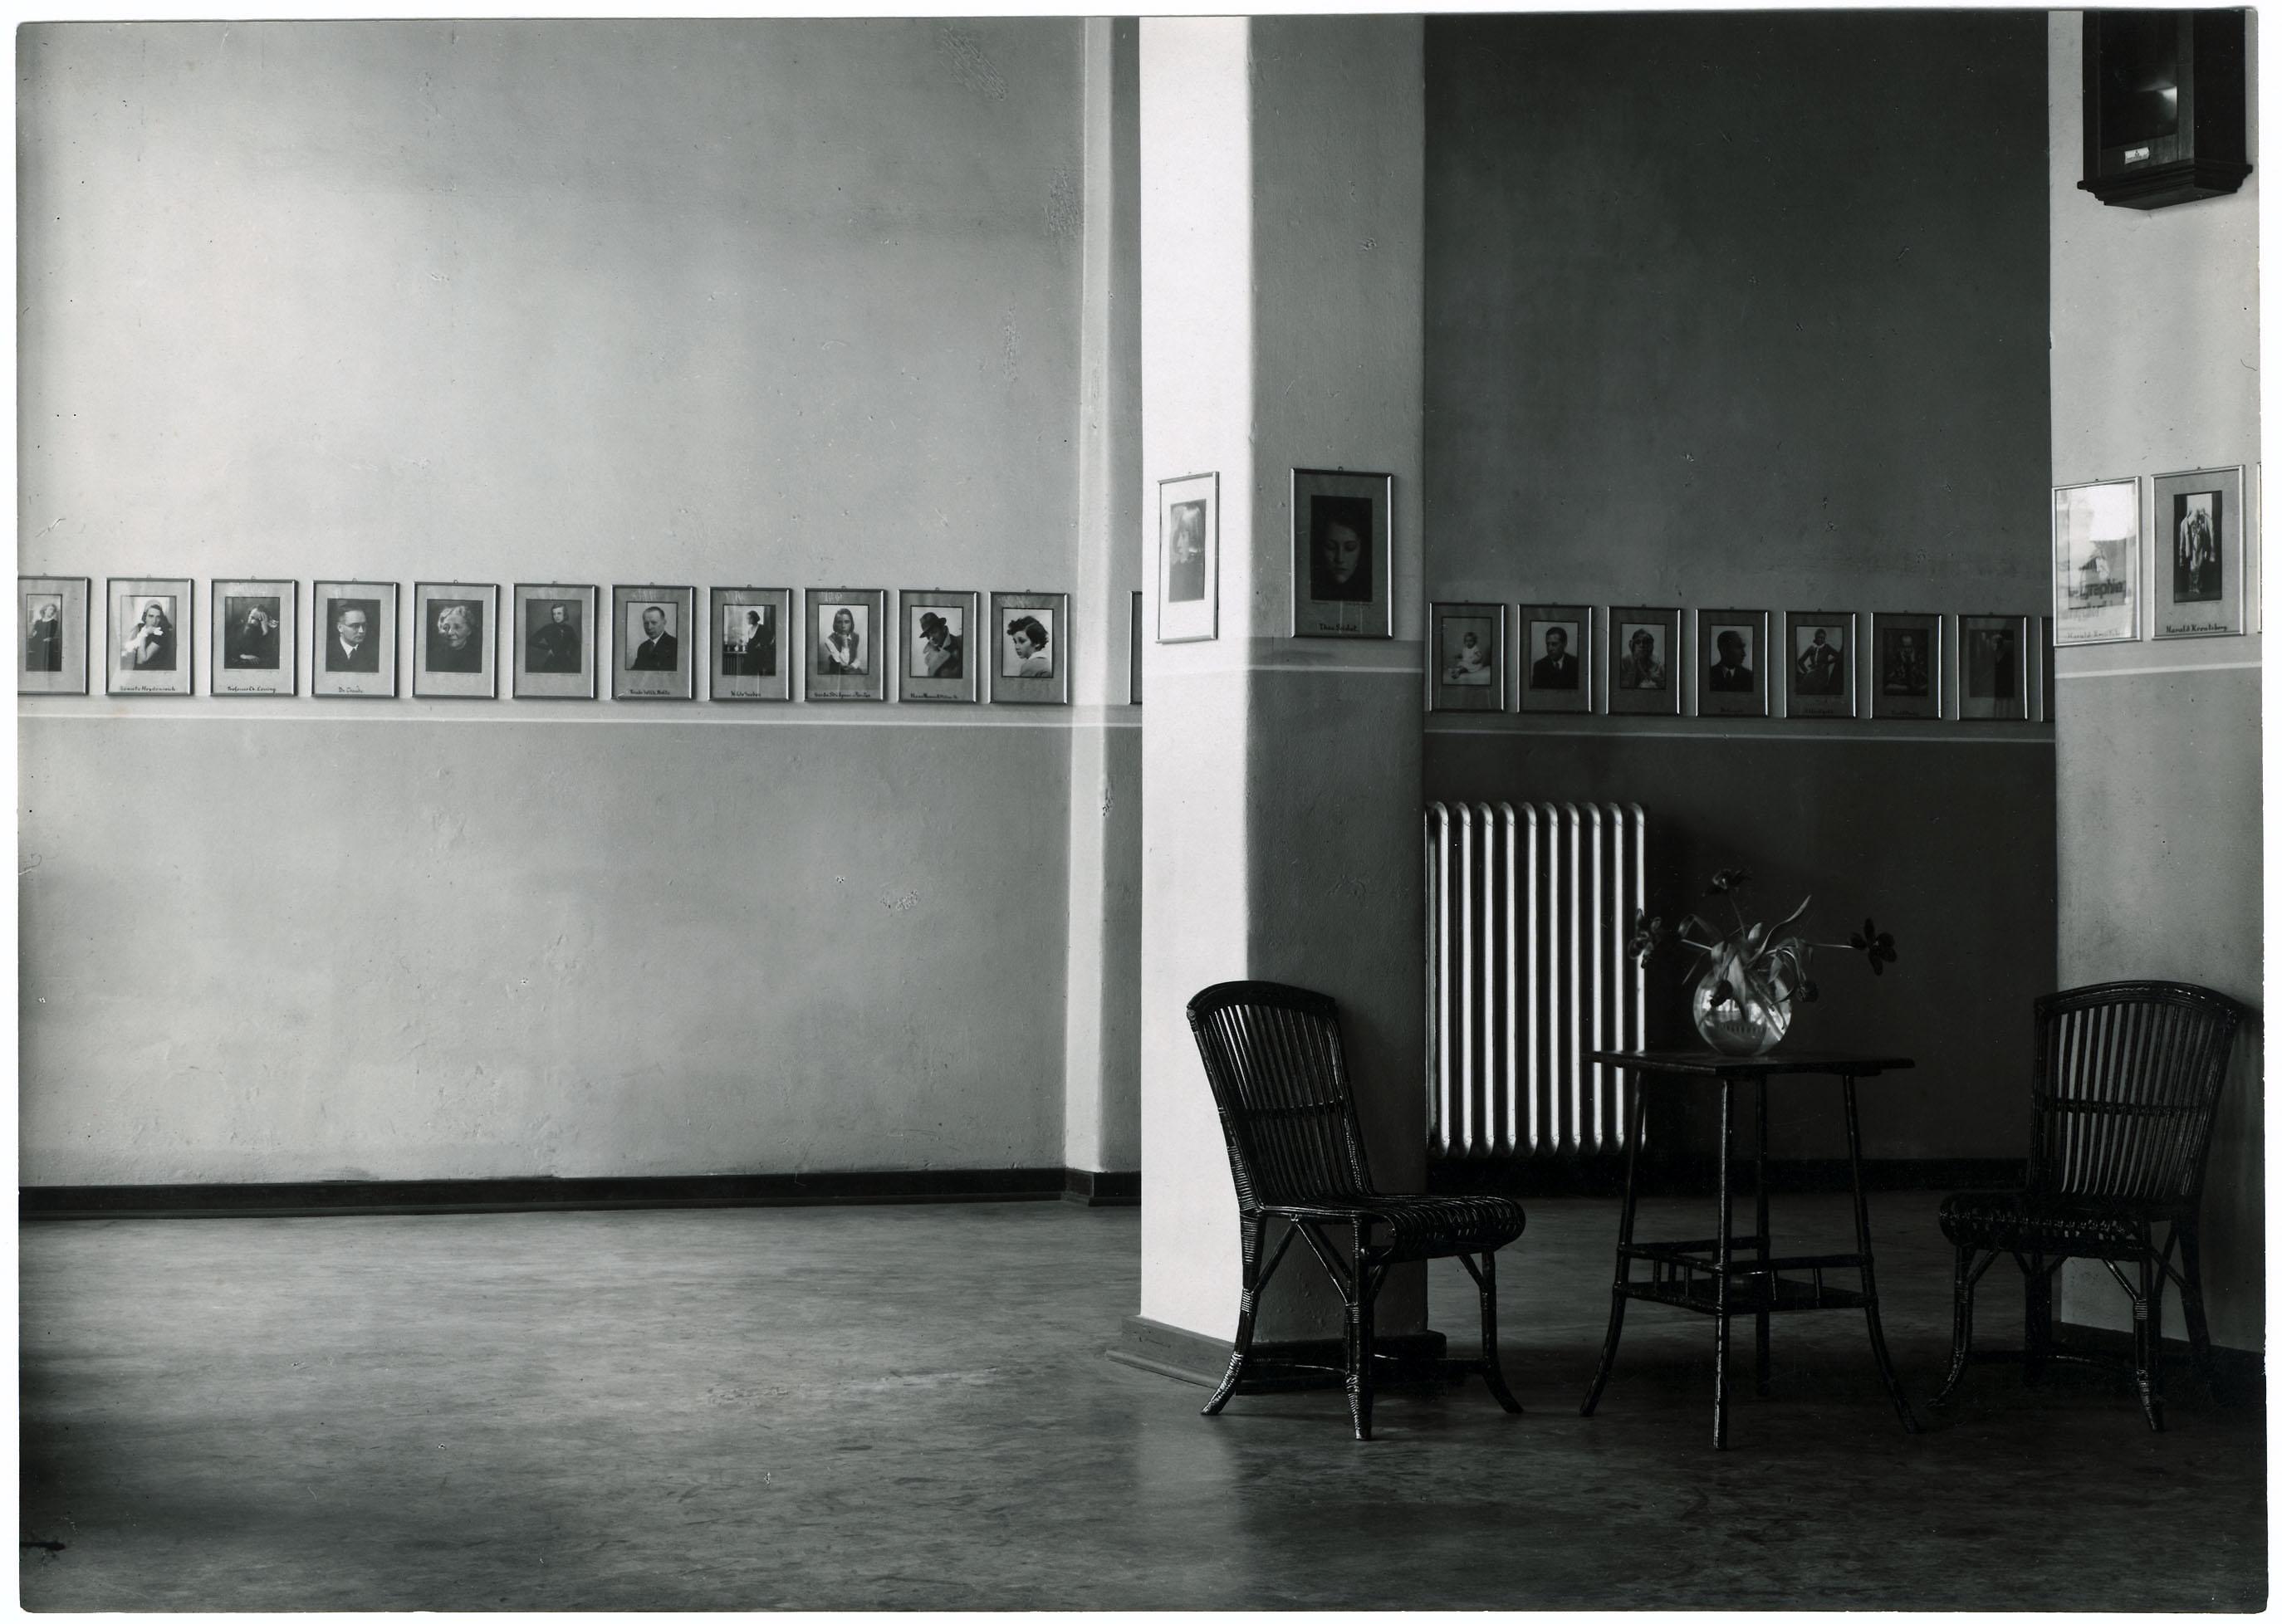 Fotoatelier Will Burgdorf | Innenansicht | Hannover 1929